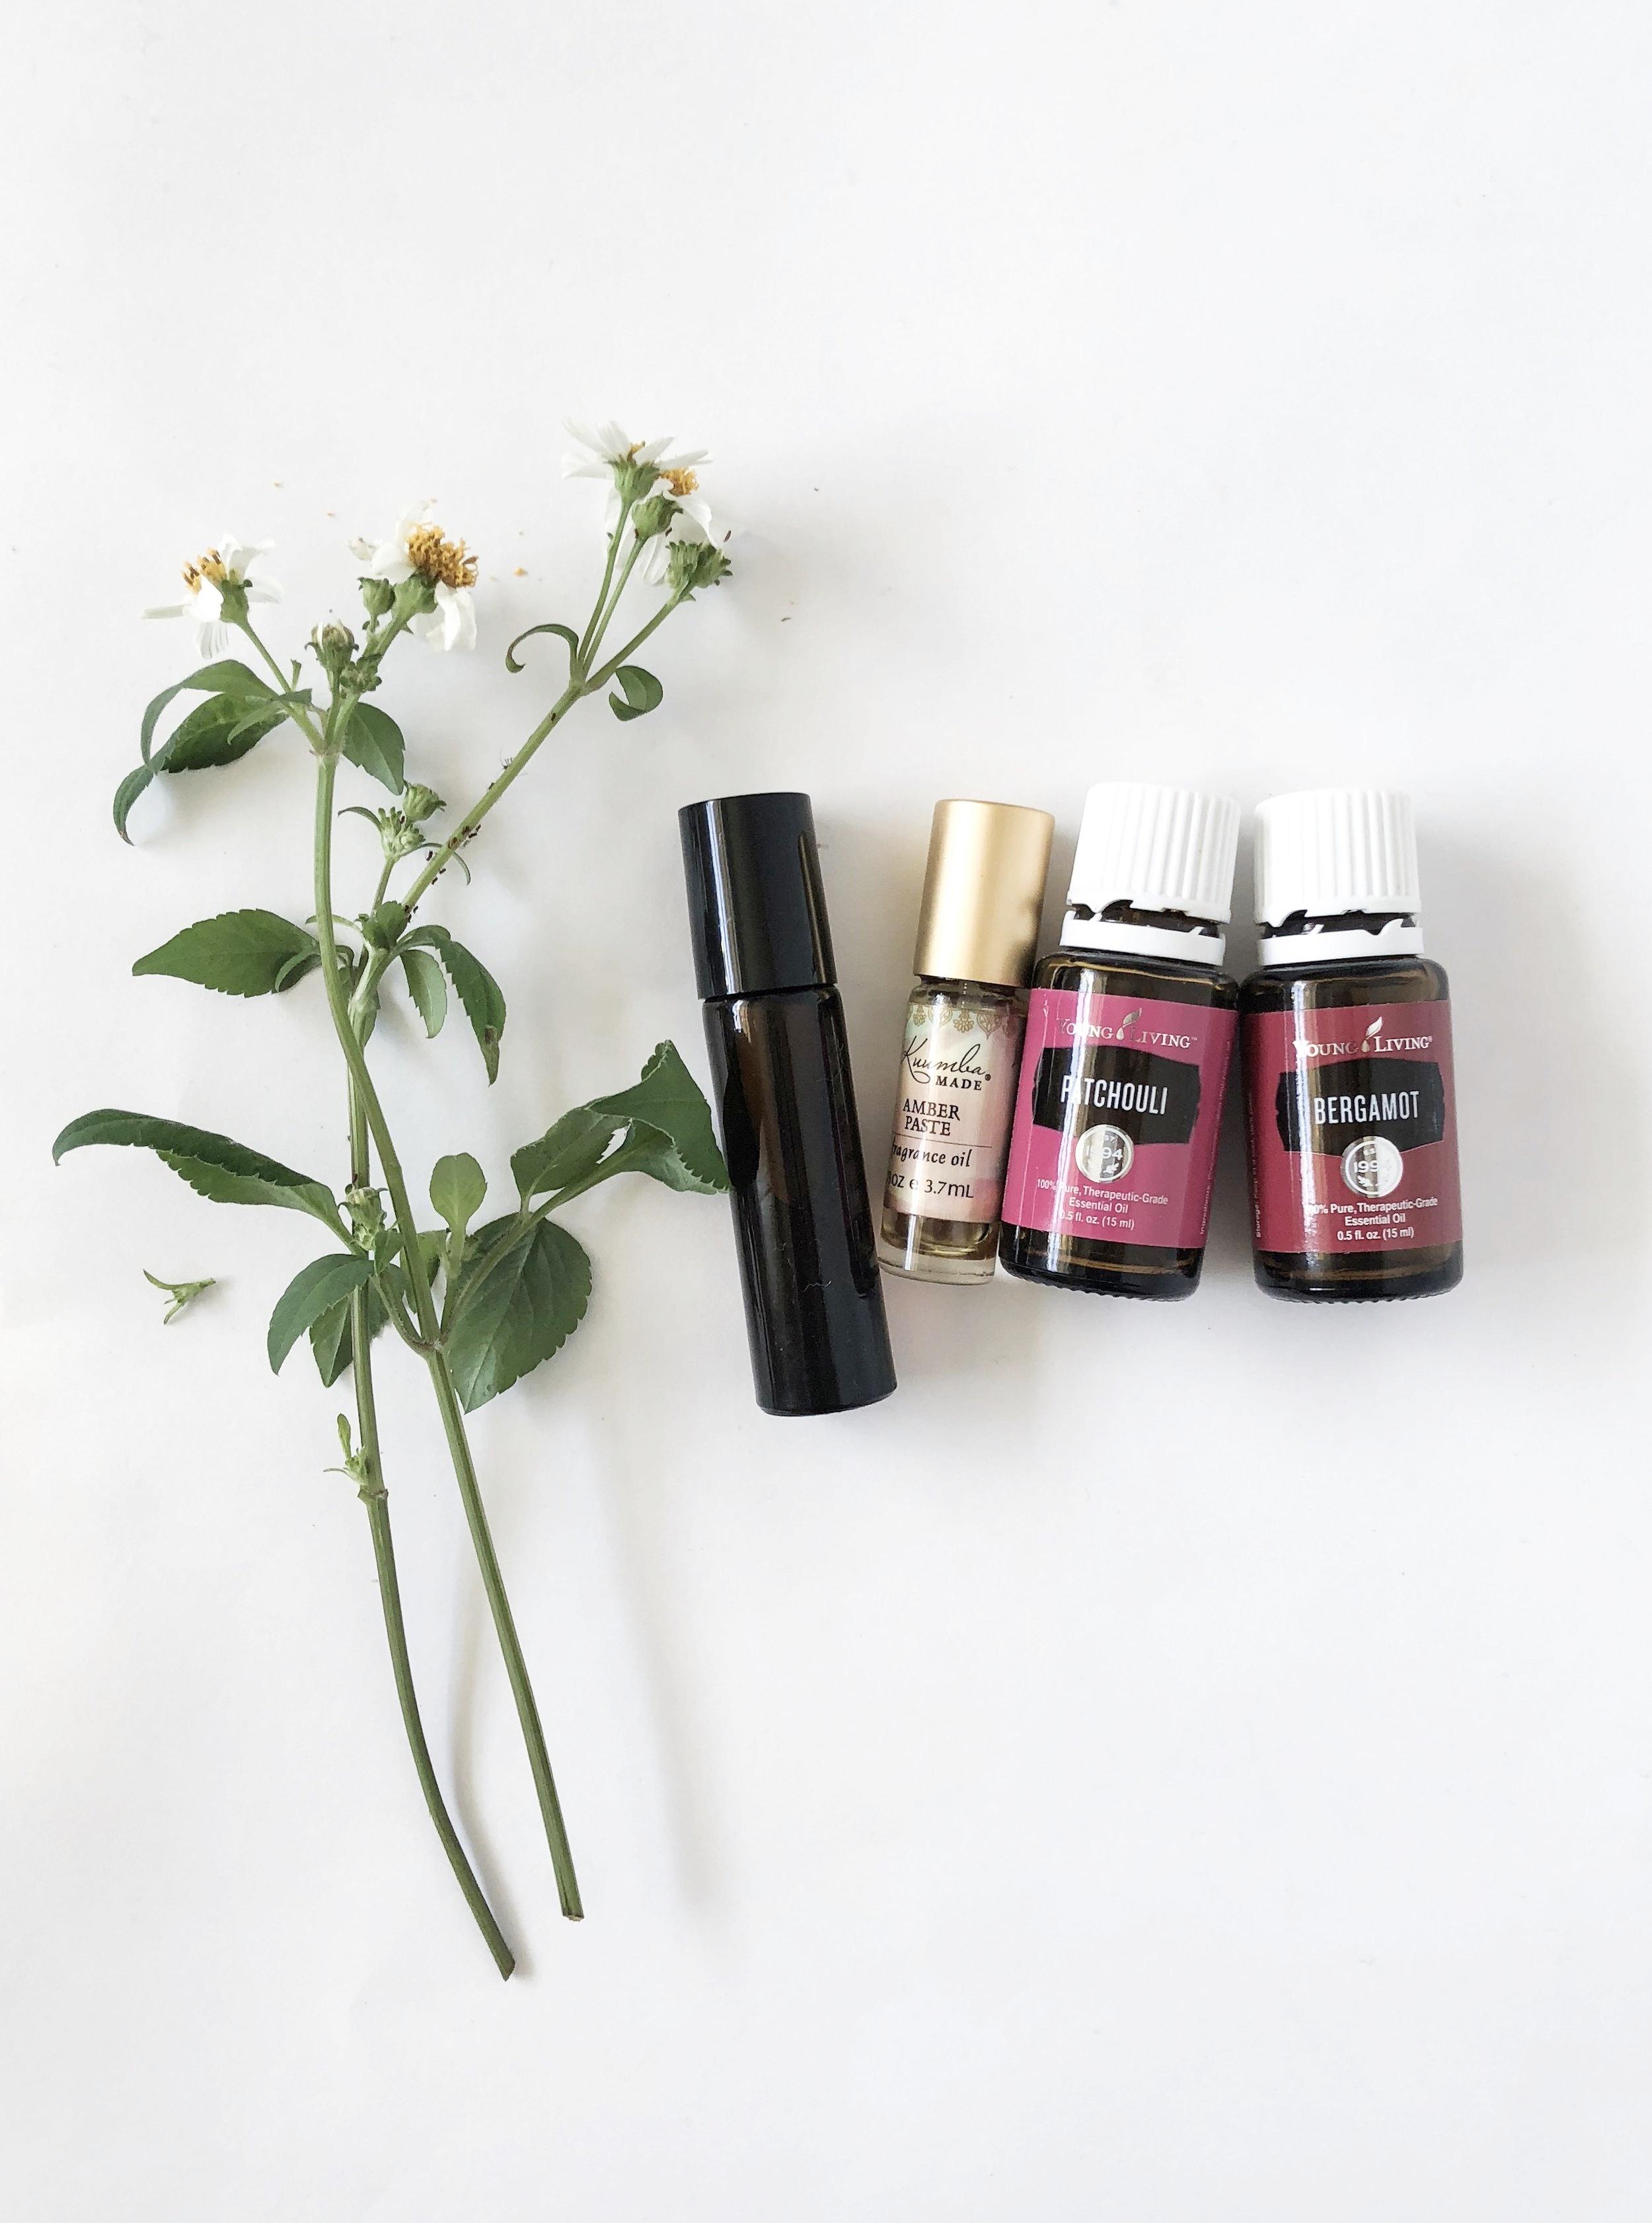 patchouli and bergamot perfume roller bottle